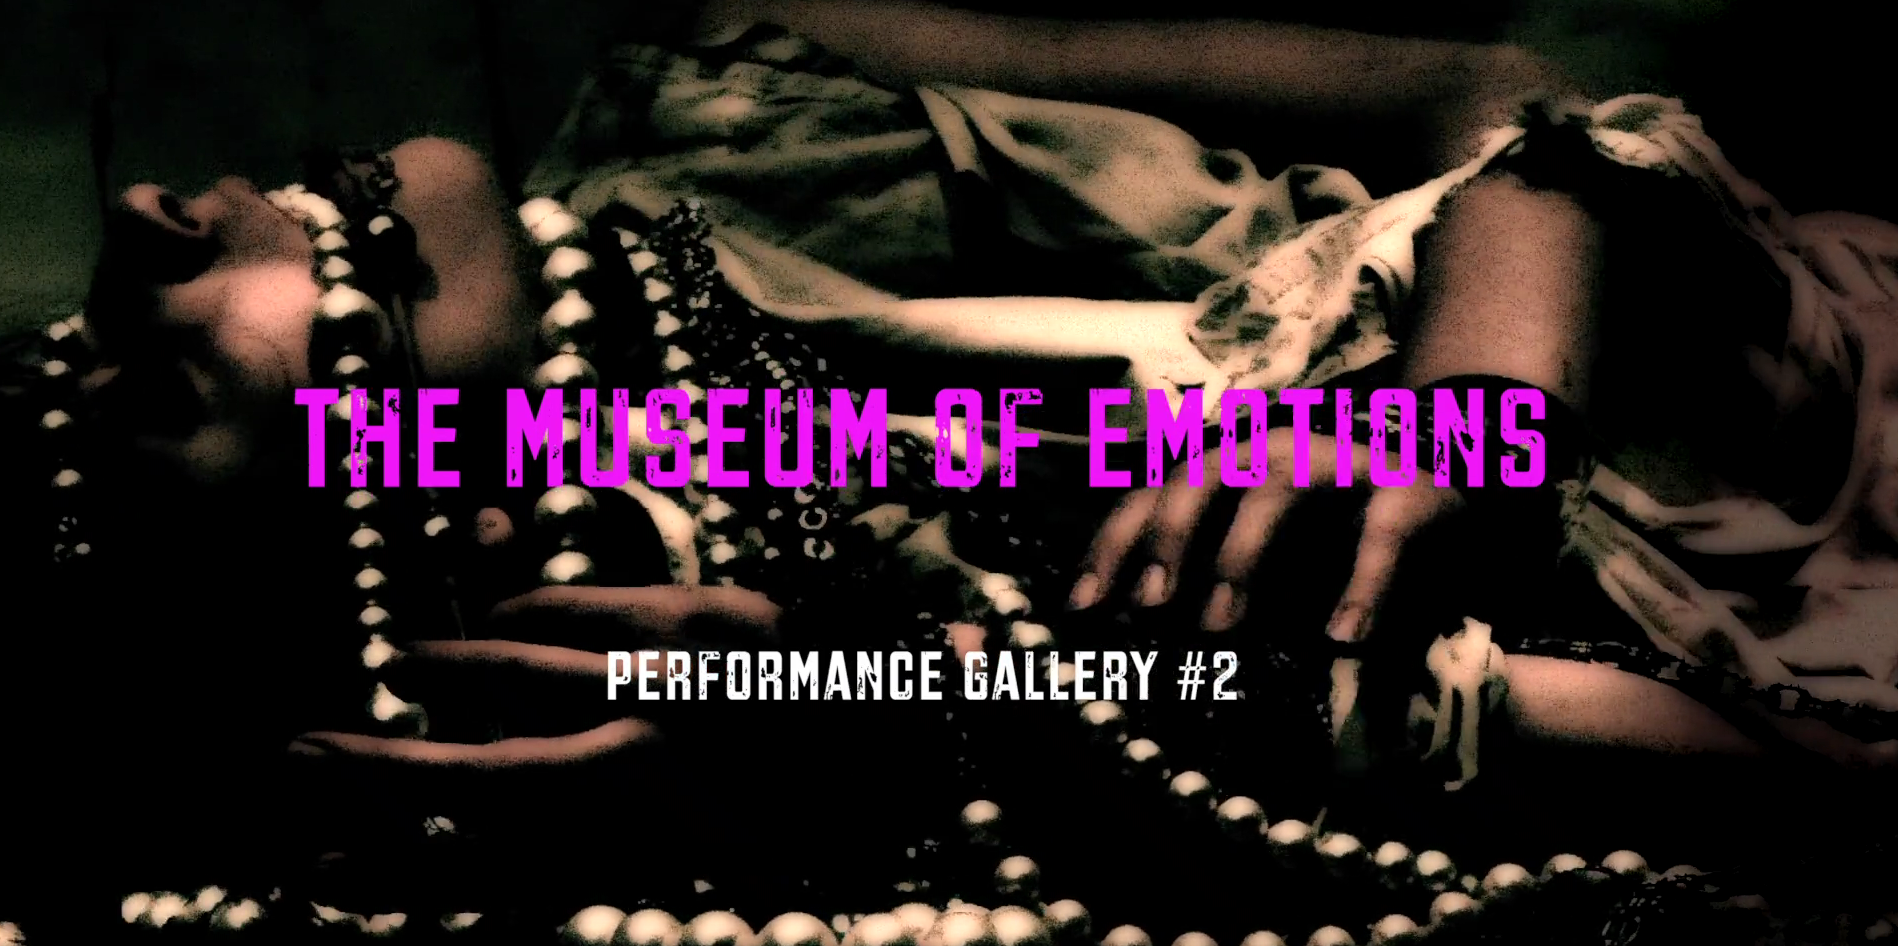 Asphalt, Muscle & Bone, Museum of Emotions, Performance Gallery #2, Film Still, Bill Hayward, cause and yvette